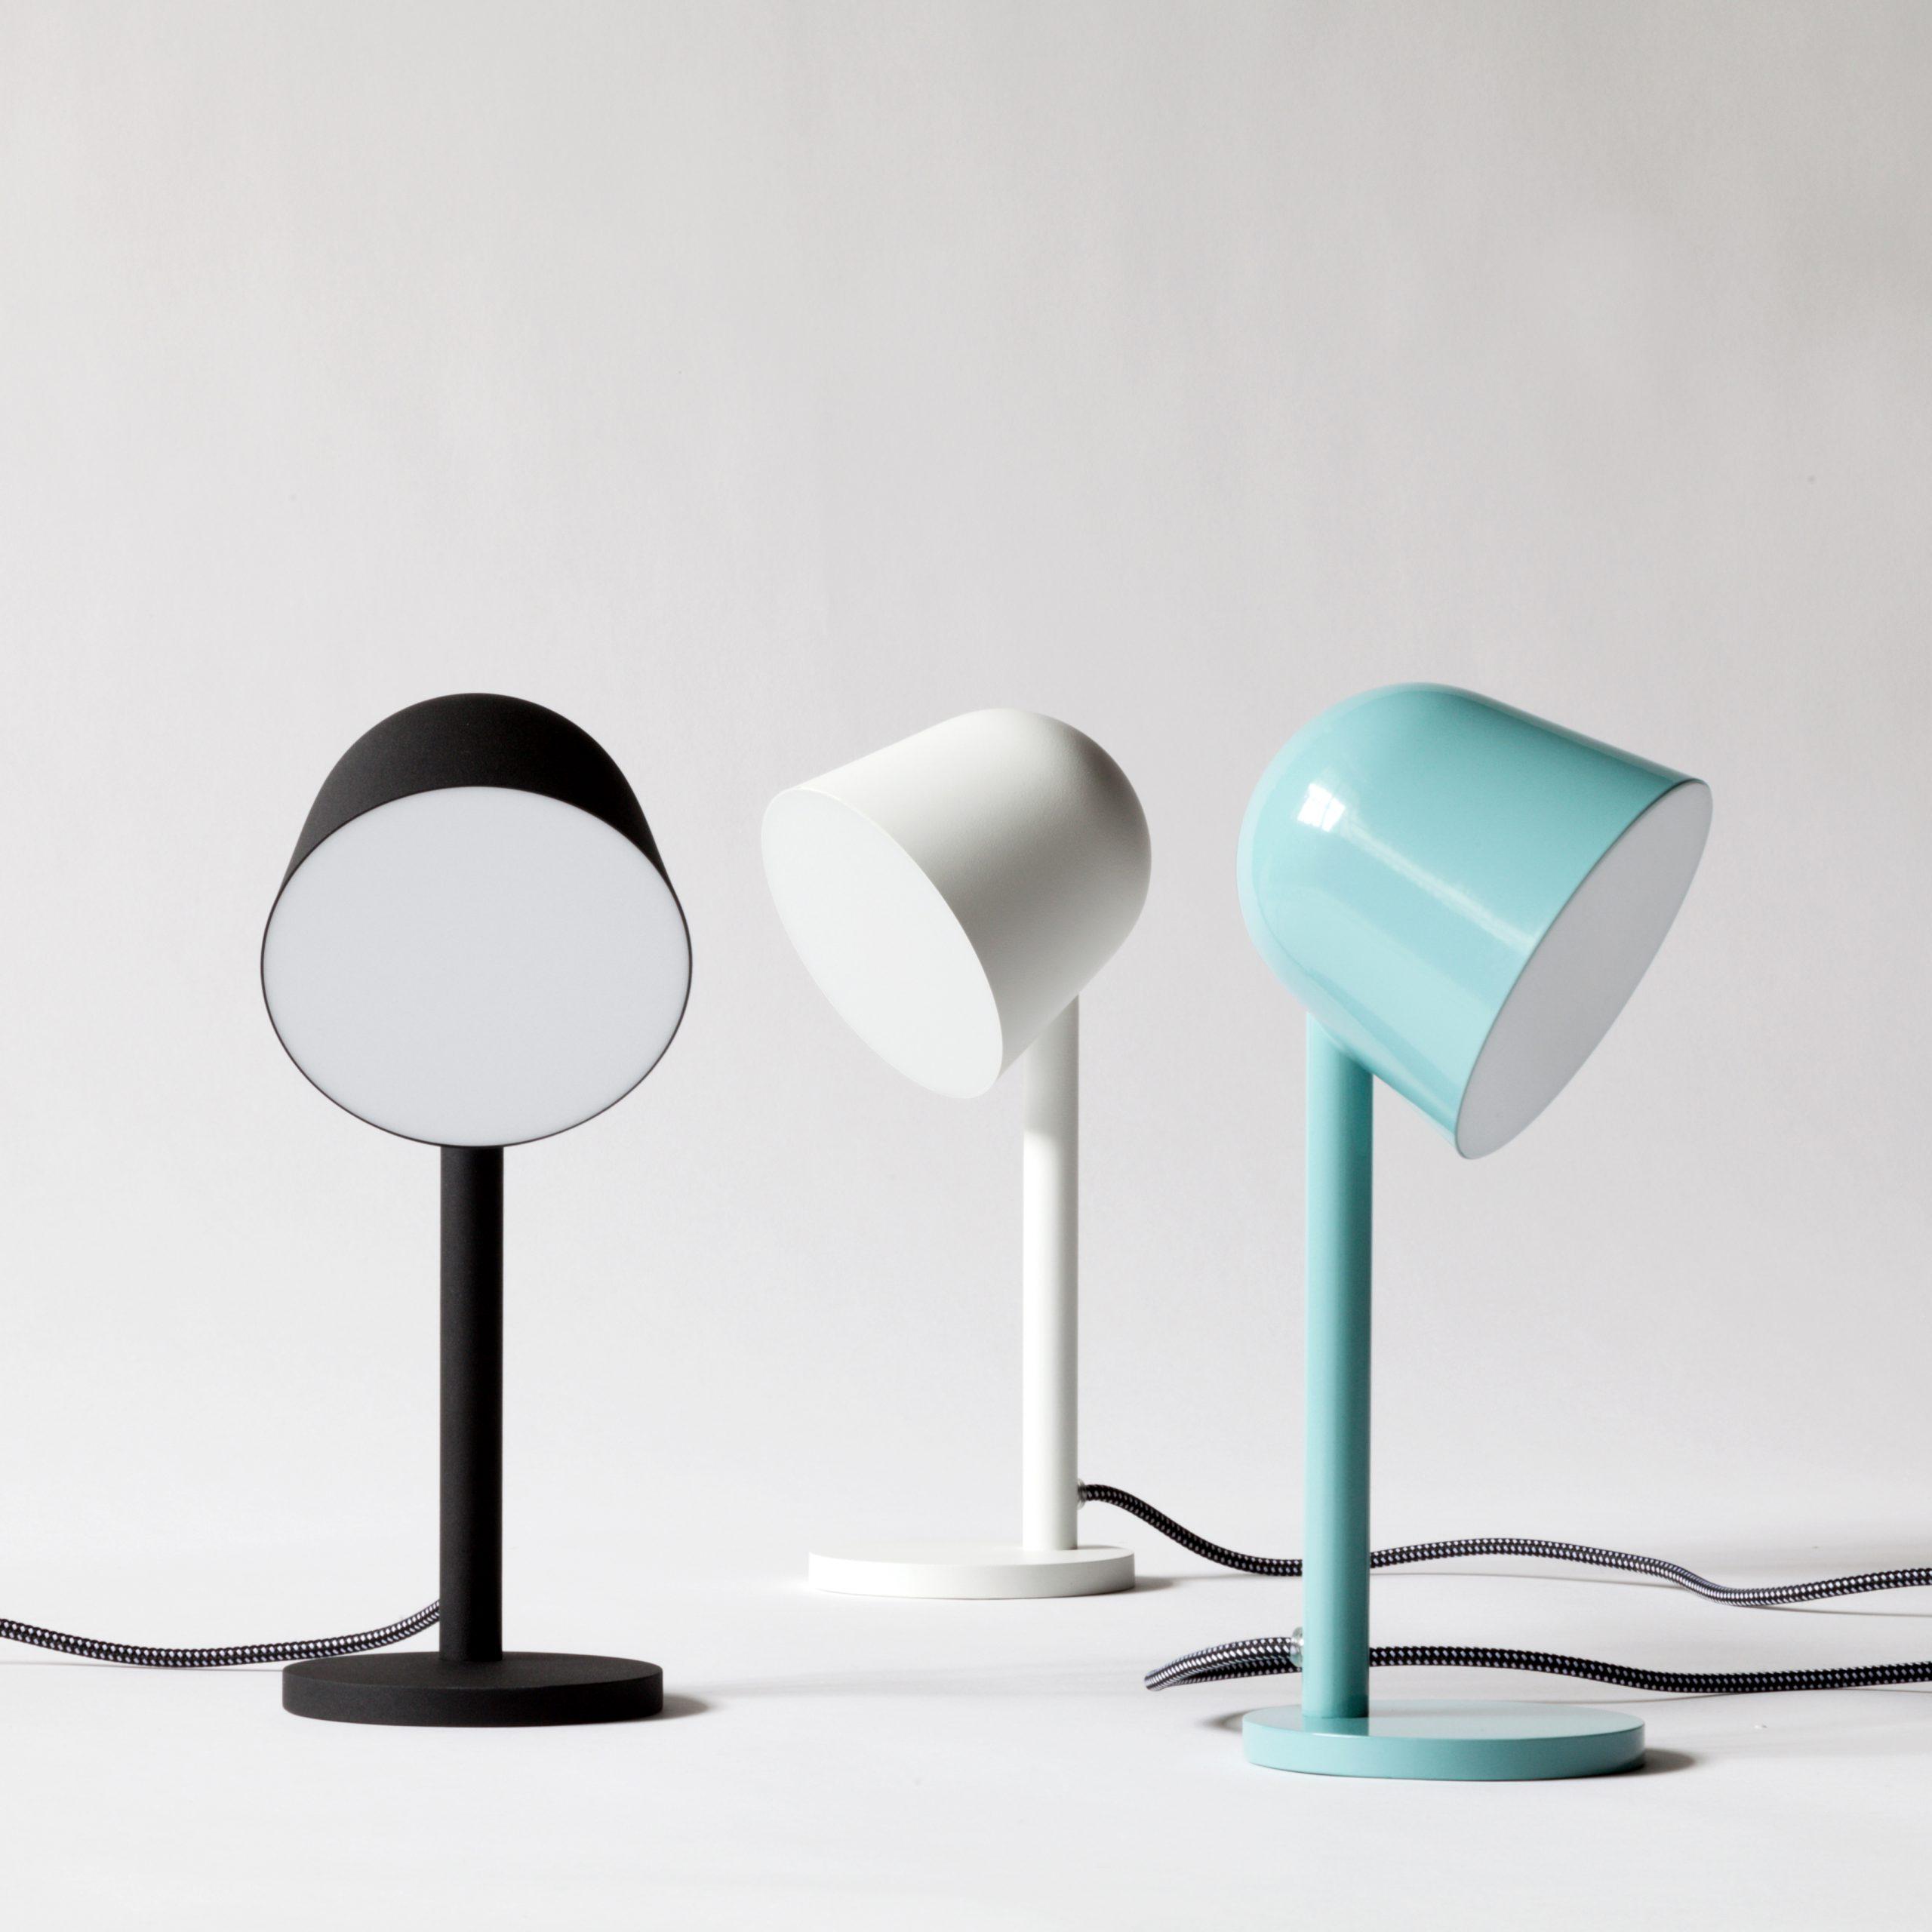 Black, blue and white Campanule lamp by Debiasi sandri for Ligne Roset